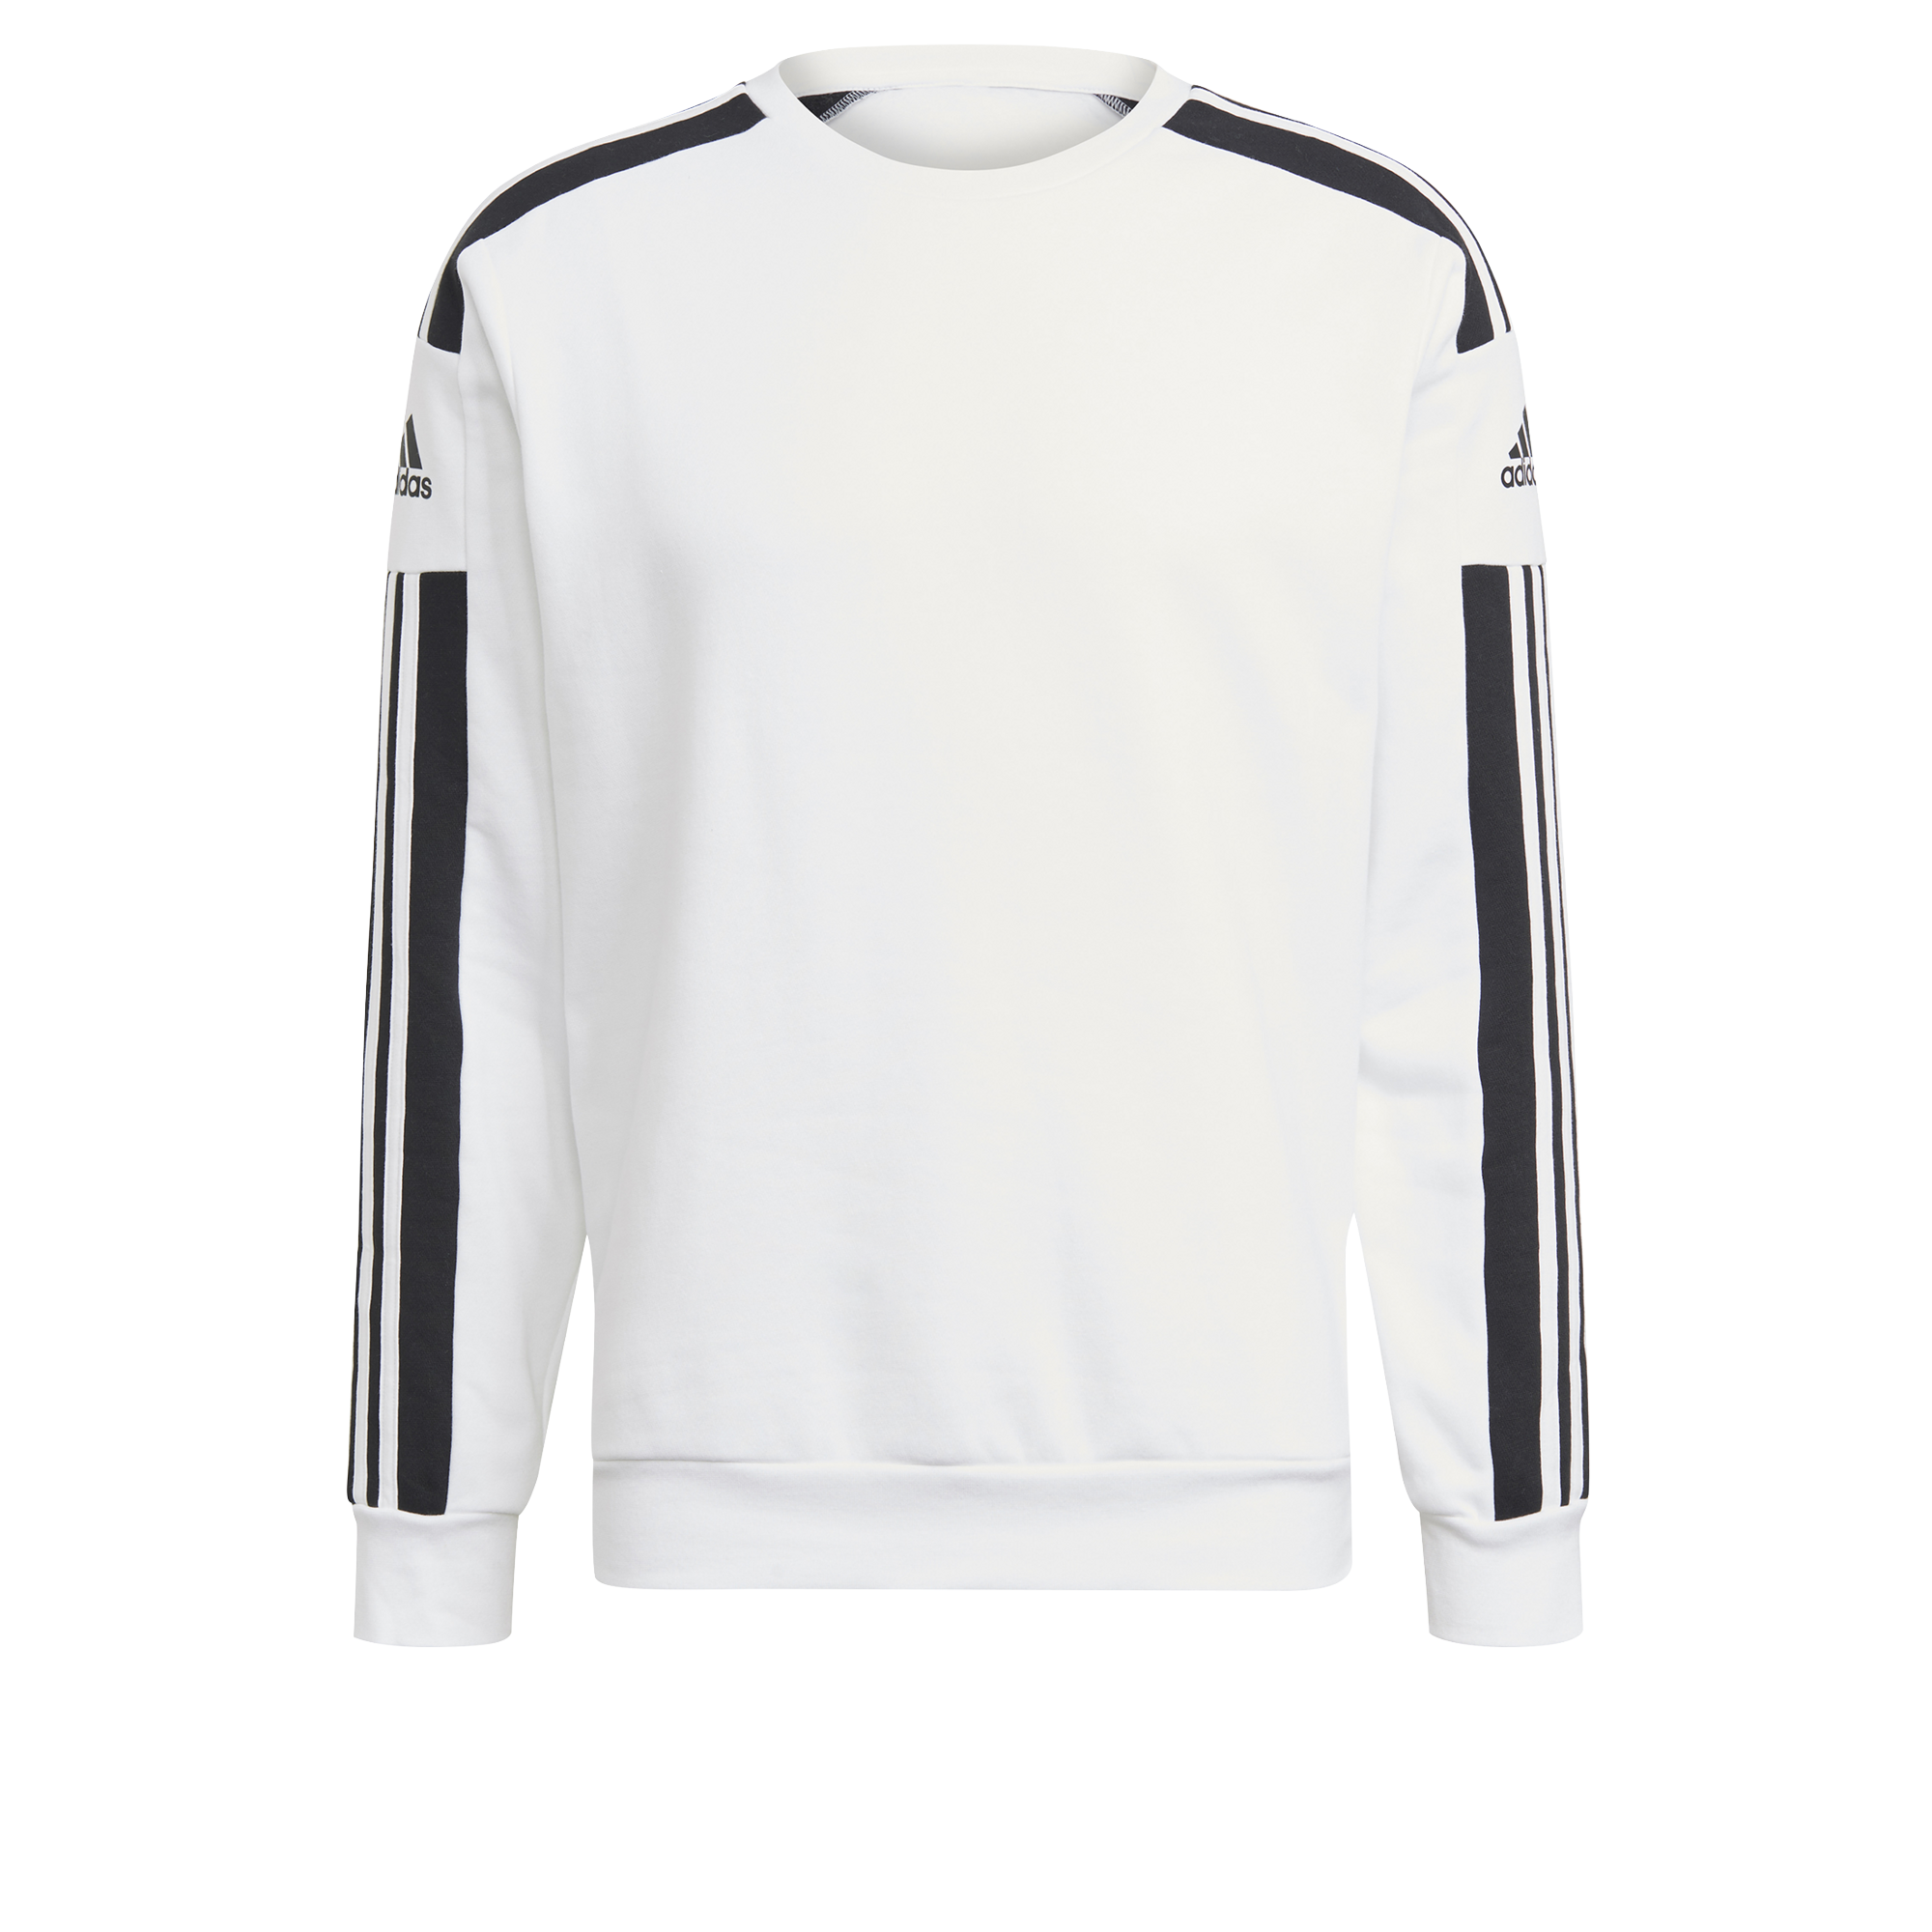 Adidas Squadra 21 Sweater